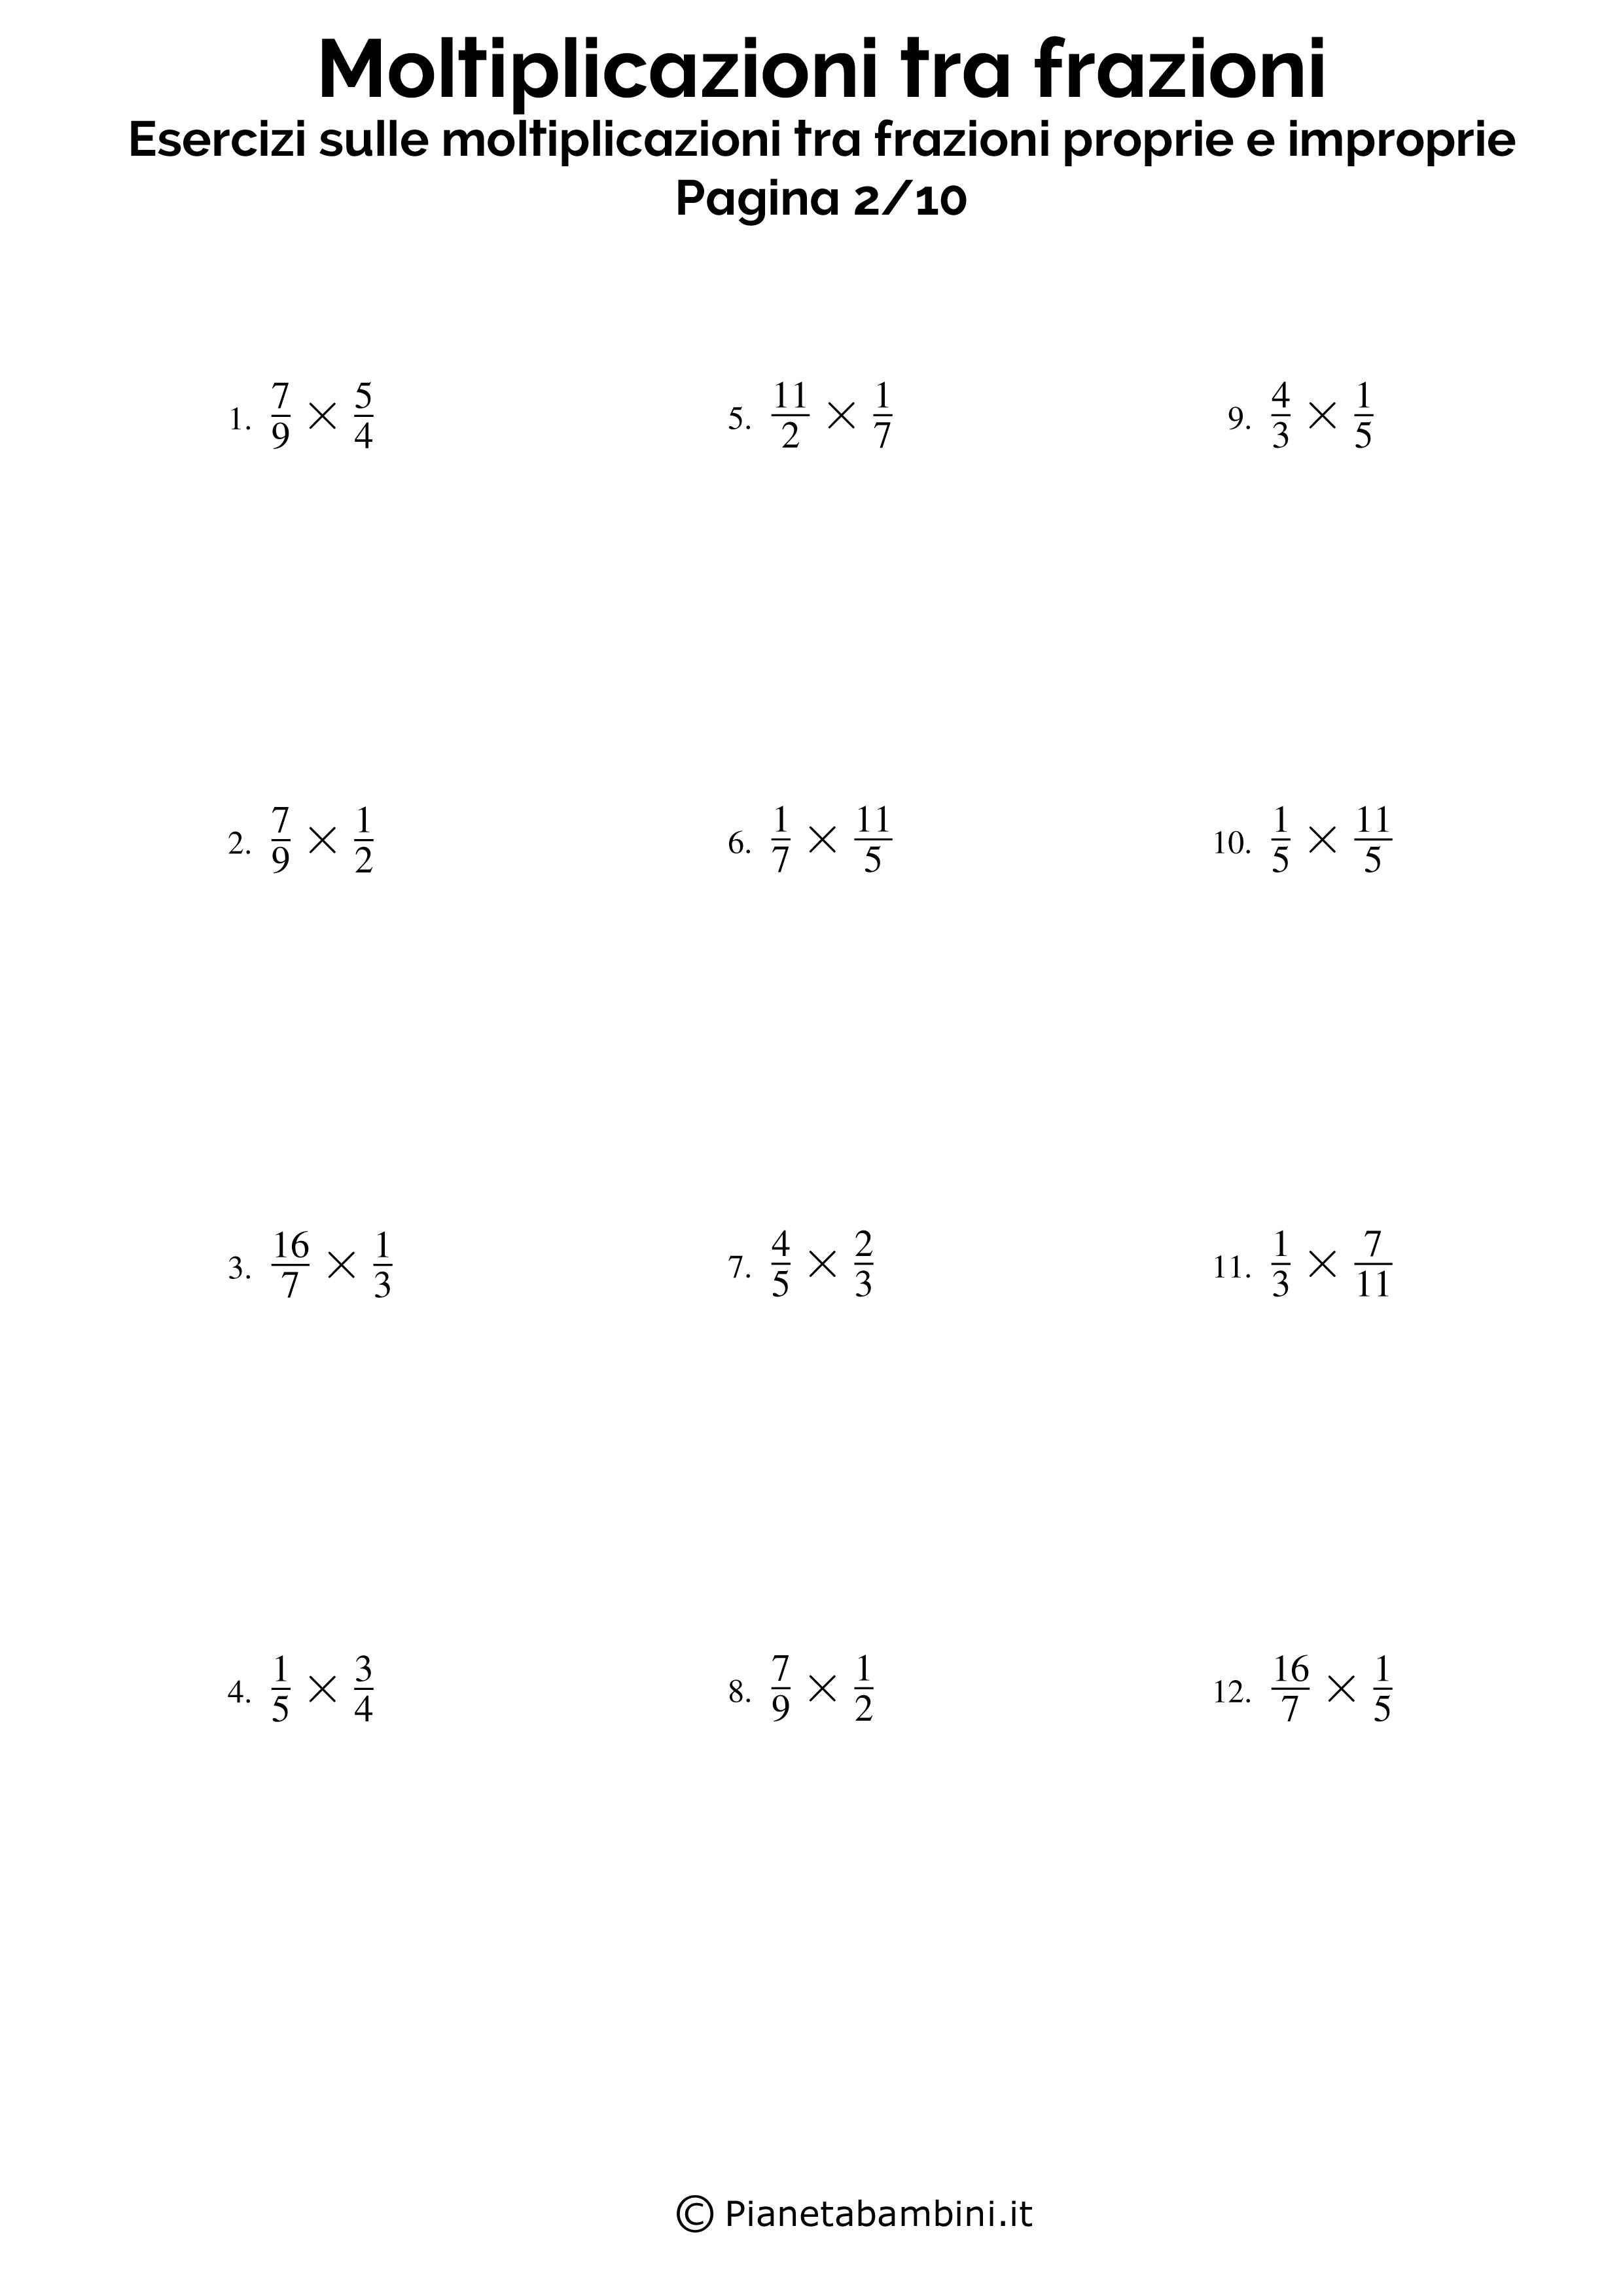 Moltiplicazioni-Frazioni-Proprie-Improprie_02